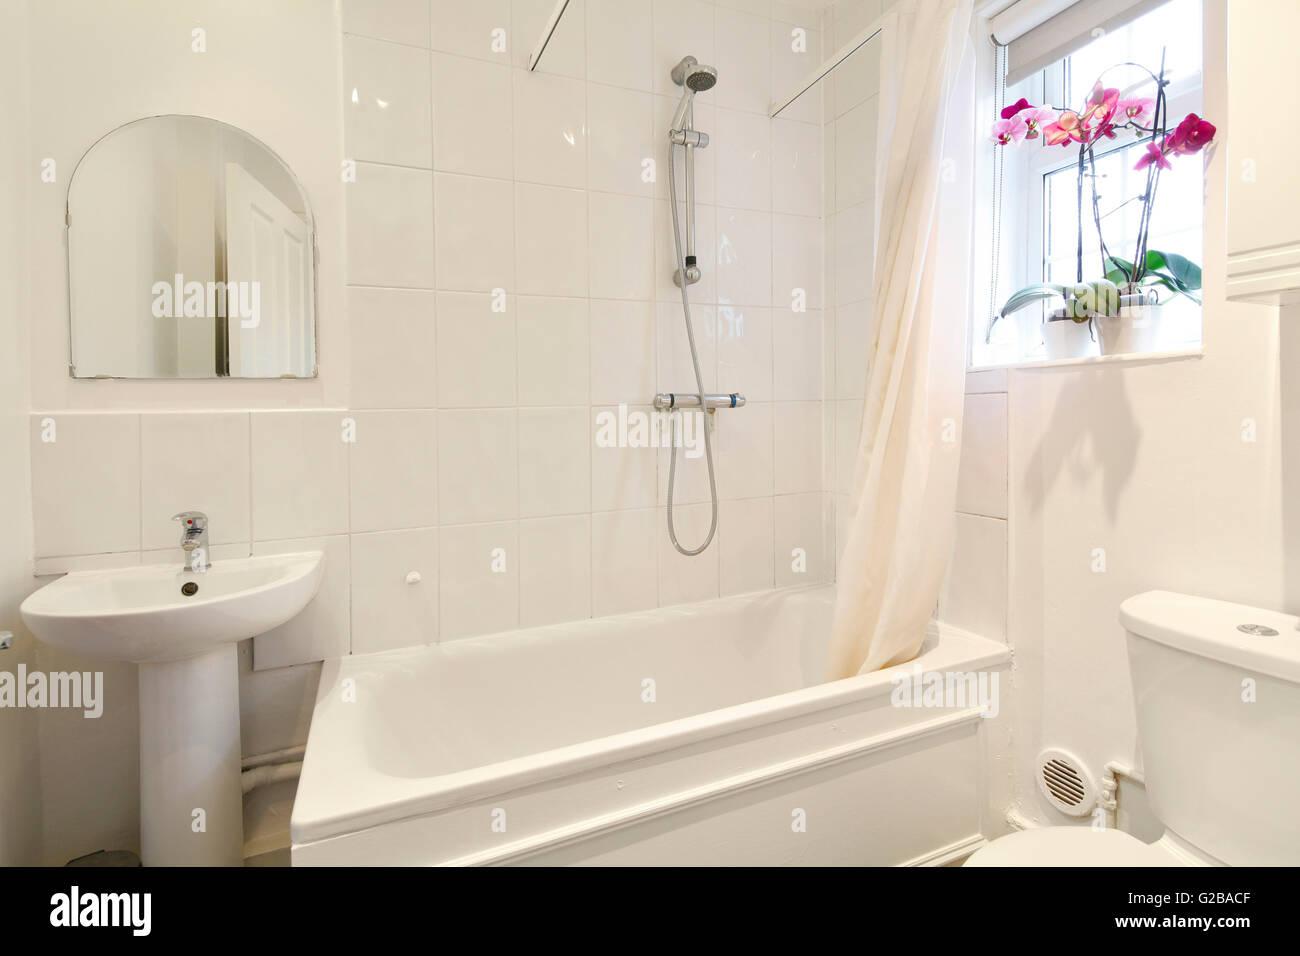 Creighton house a nord di londra moderno bagno bianco con i